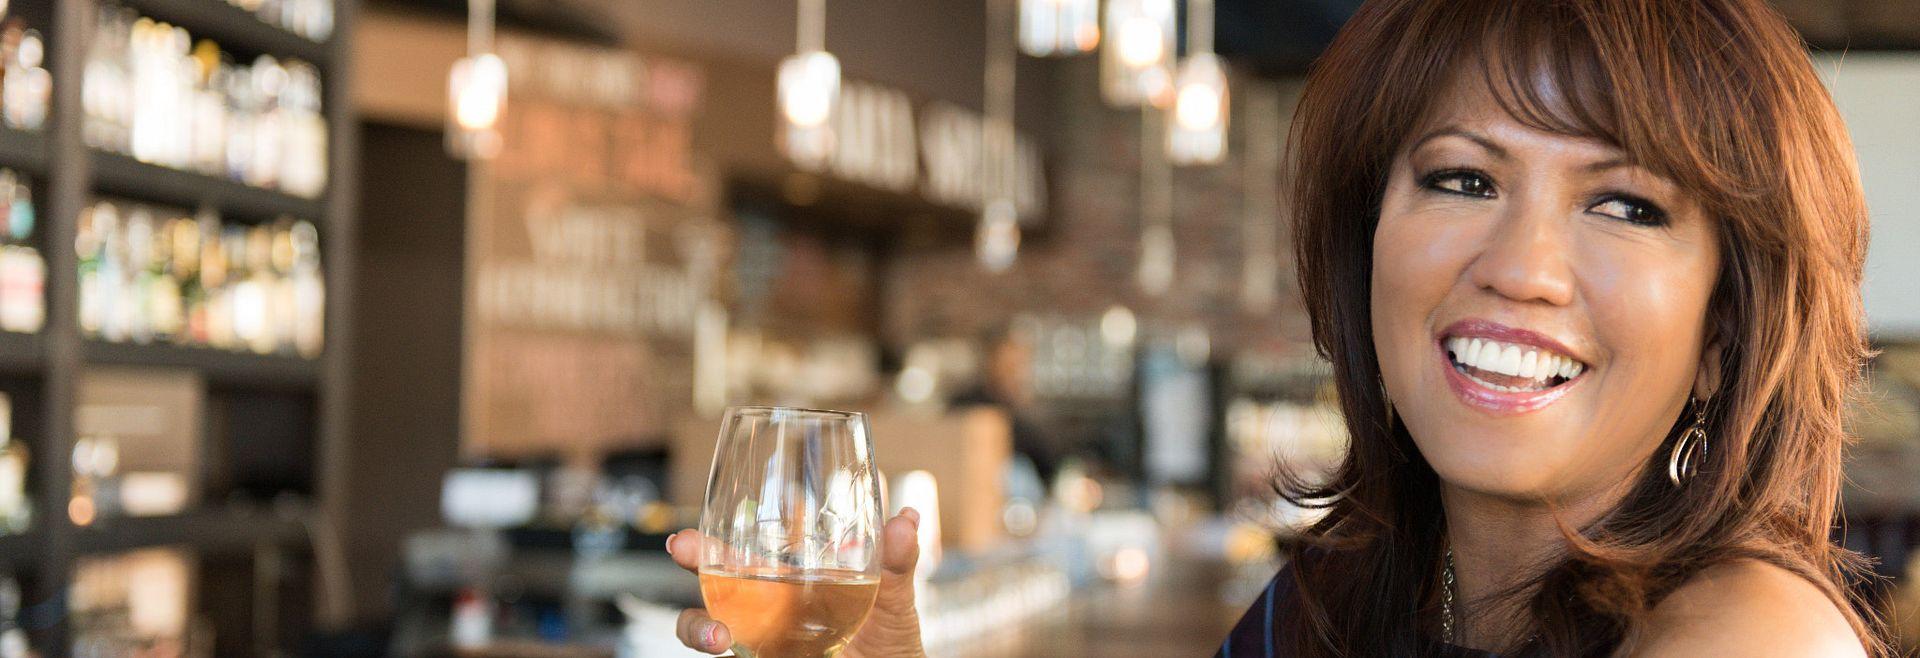 Woman enjoying a drink at the bar